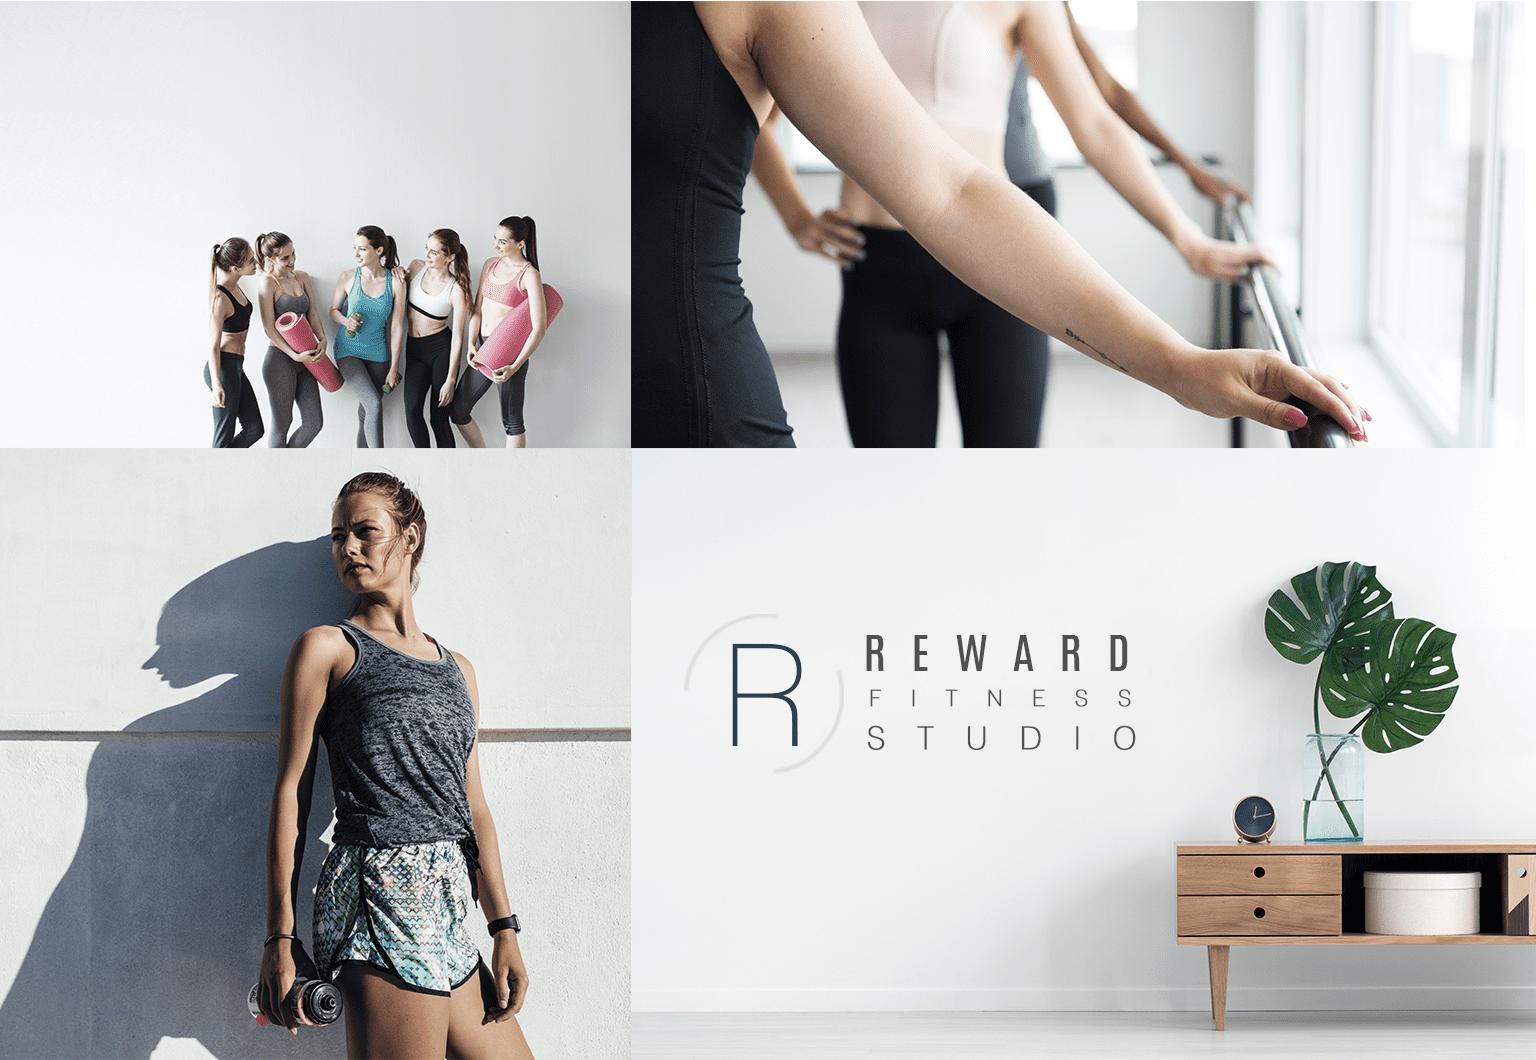 Reward-Fitness-Studio-Designed-by-Oliver-Spence-Creative-2